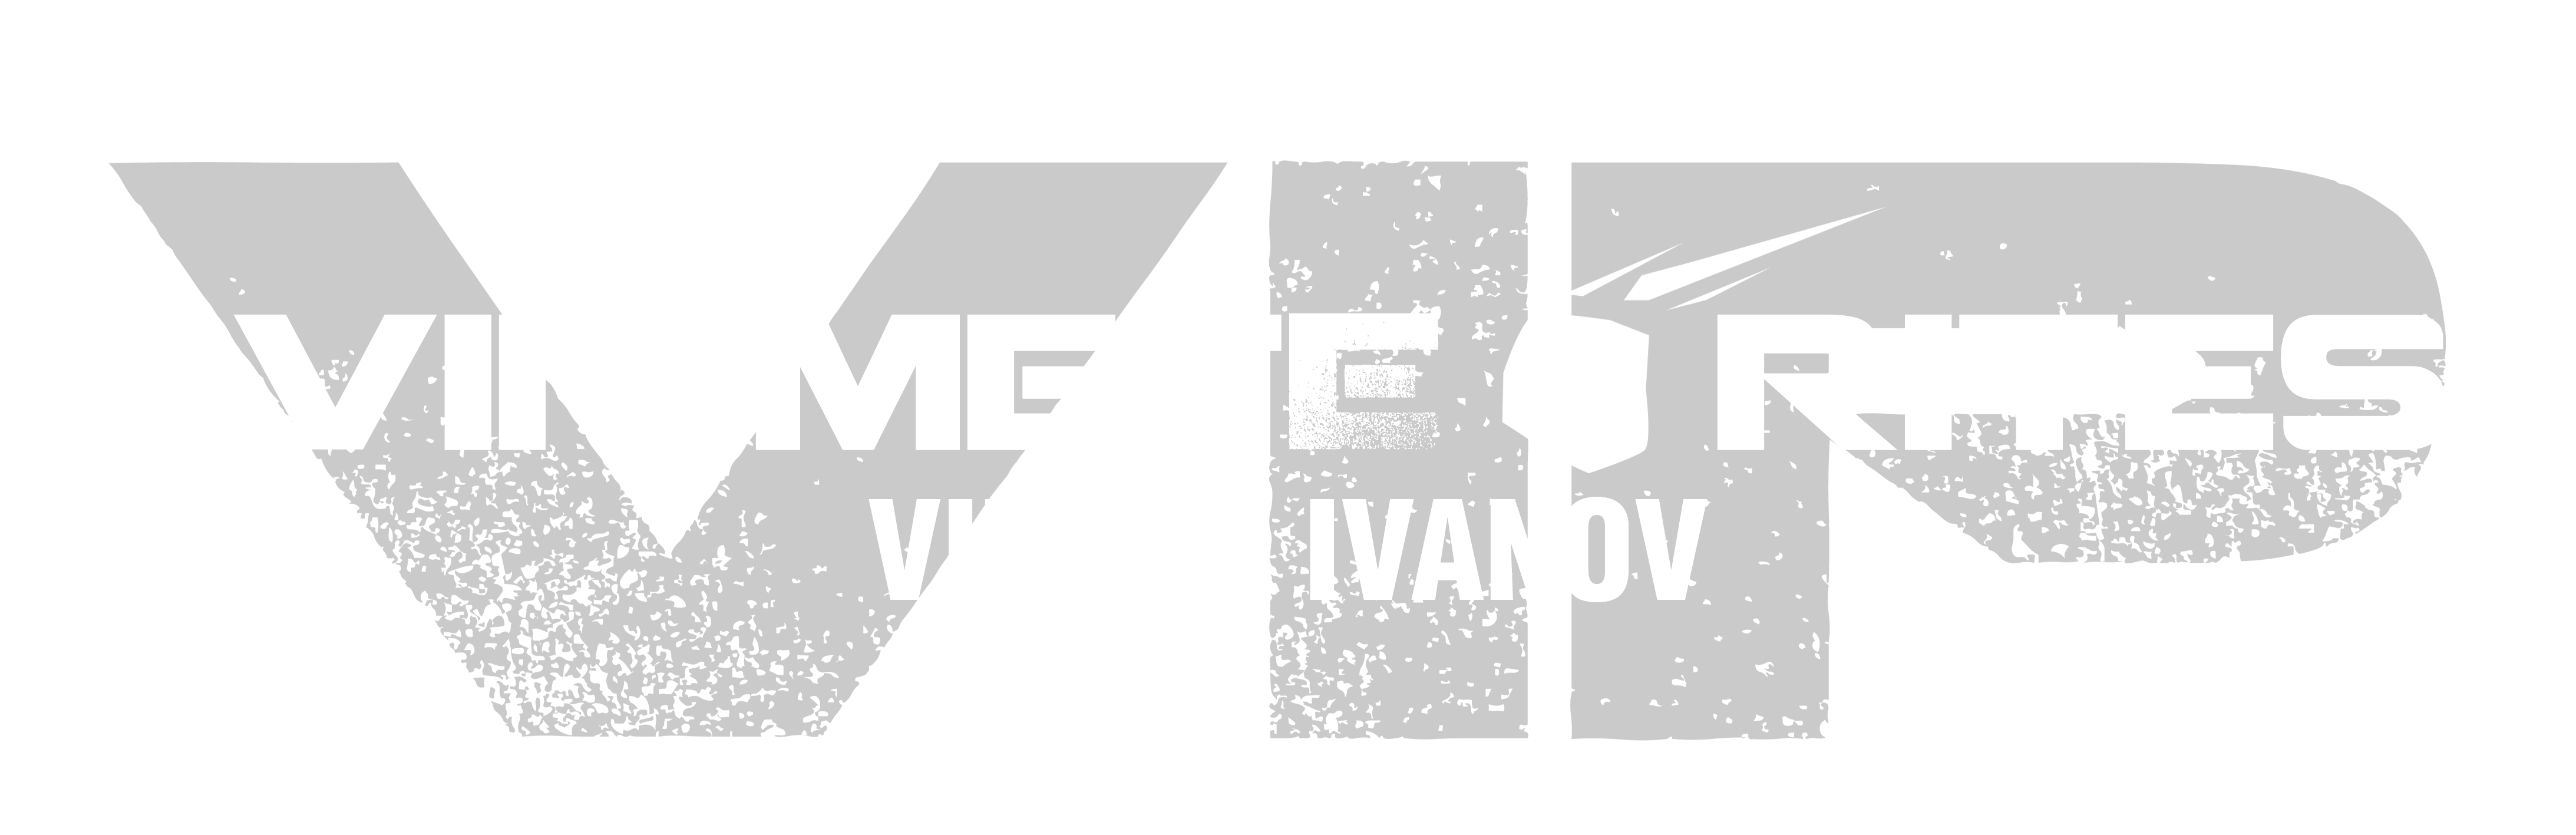 logo_vipmeteorites